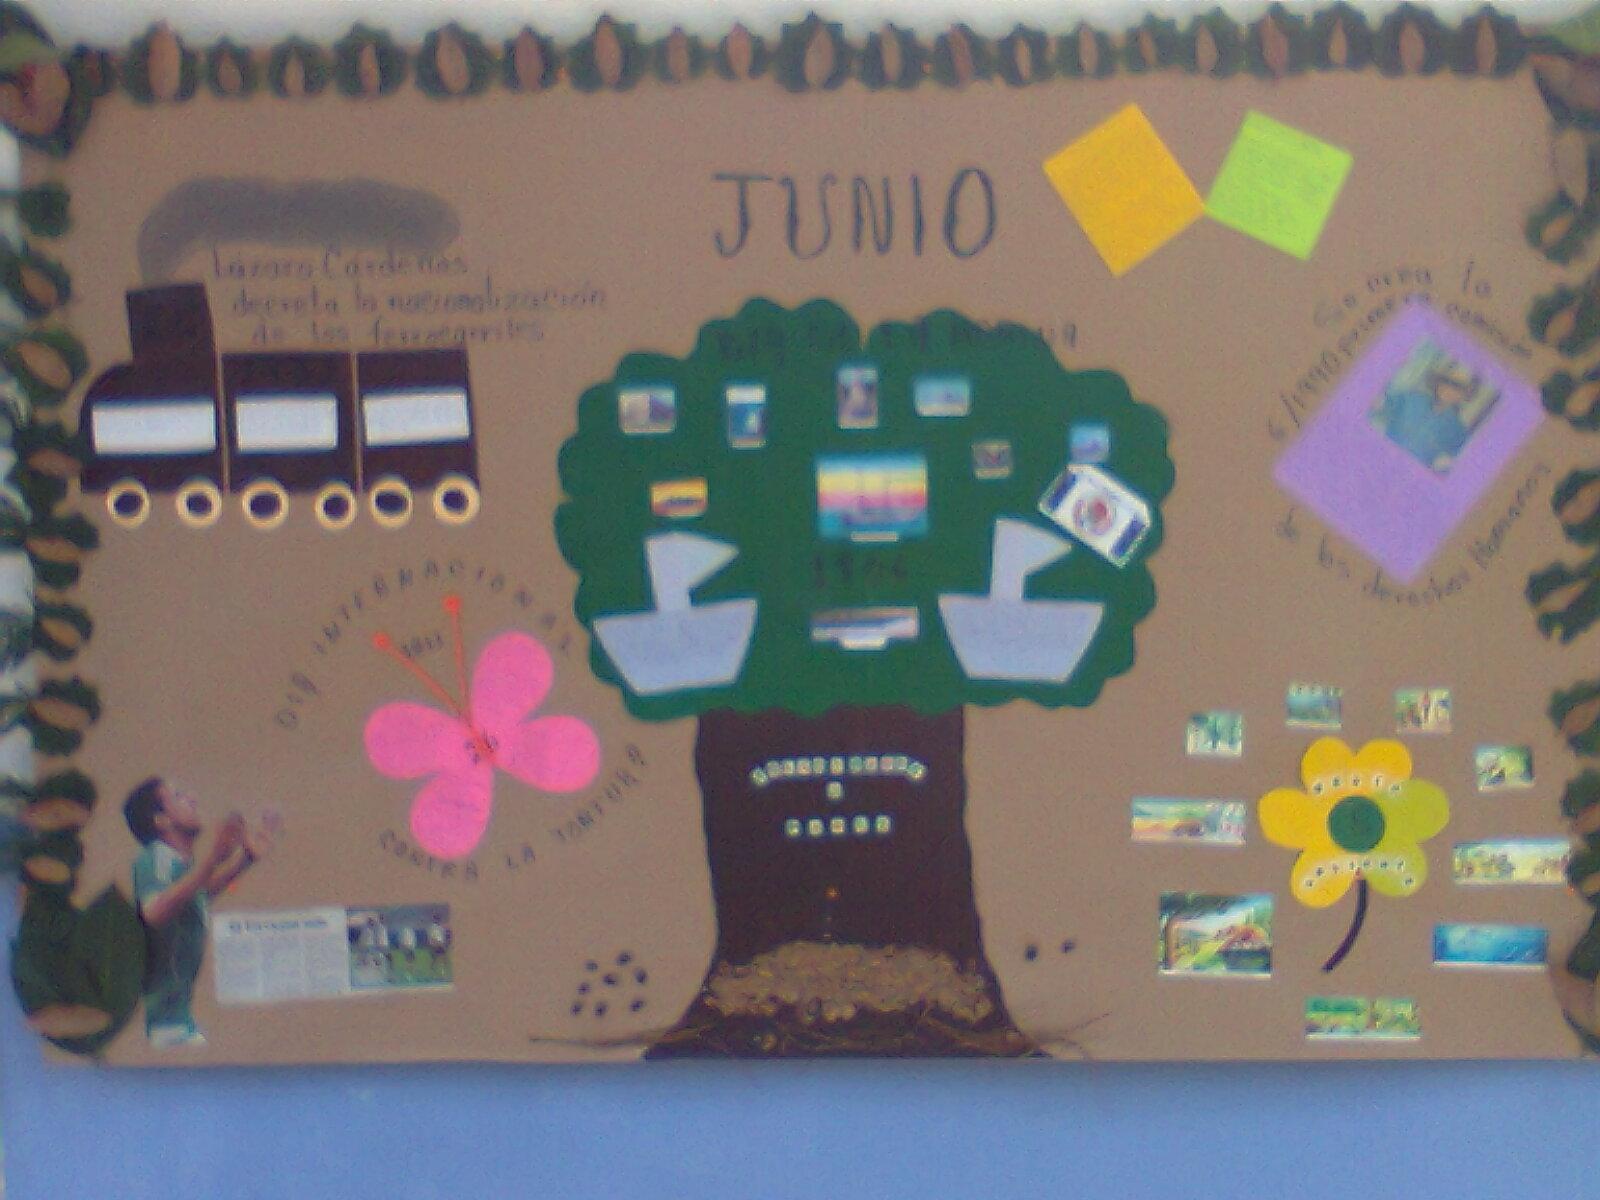 Peri dico mural mes de junio 2 imagenes educativas for Mural una familia chicana